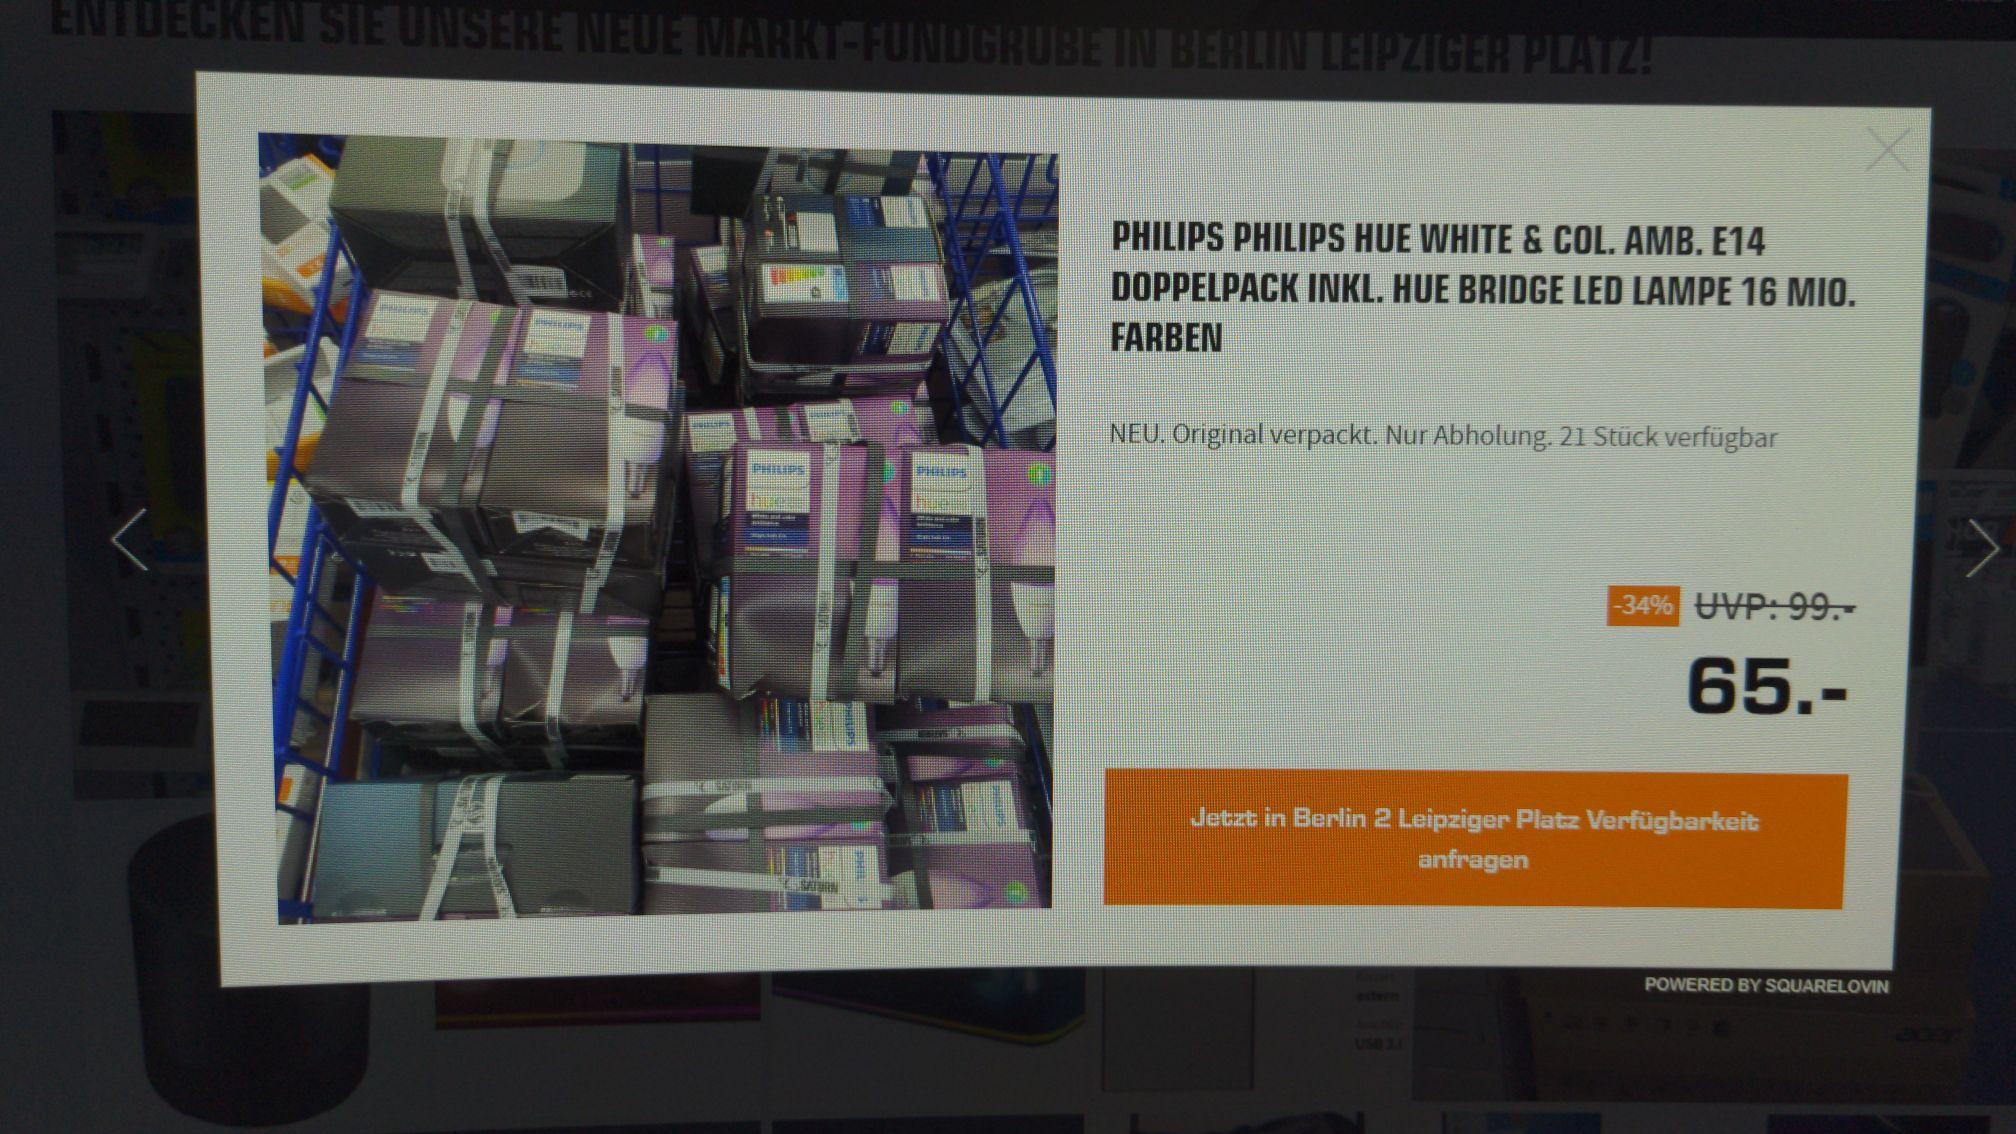 Lokal - Philips Hue E14 Color Doppelpack inkl. Bridge - Saturn Berlin Mall of Berlin